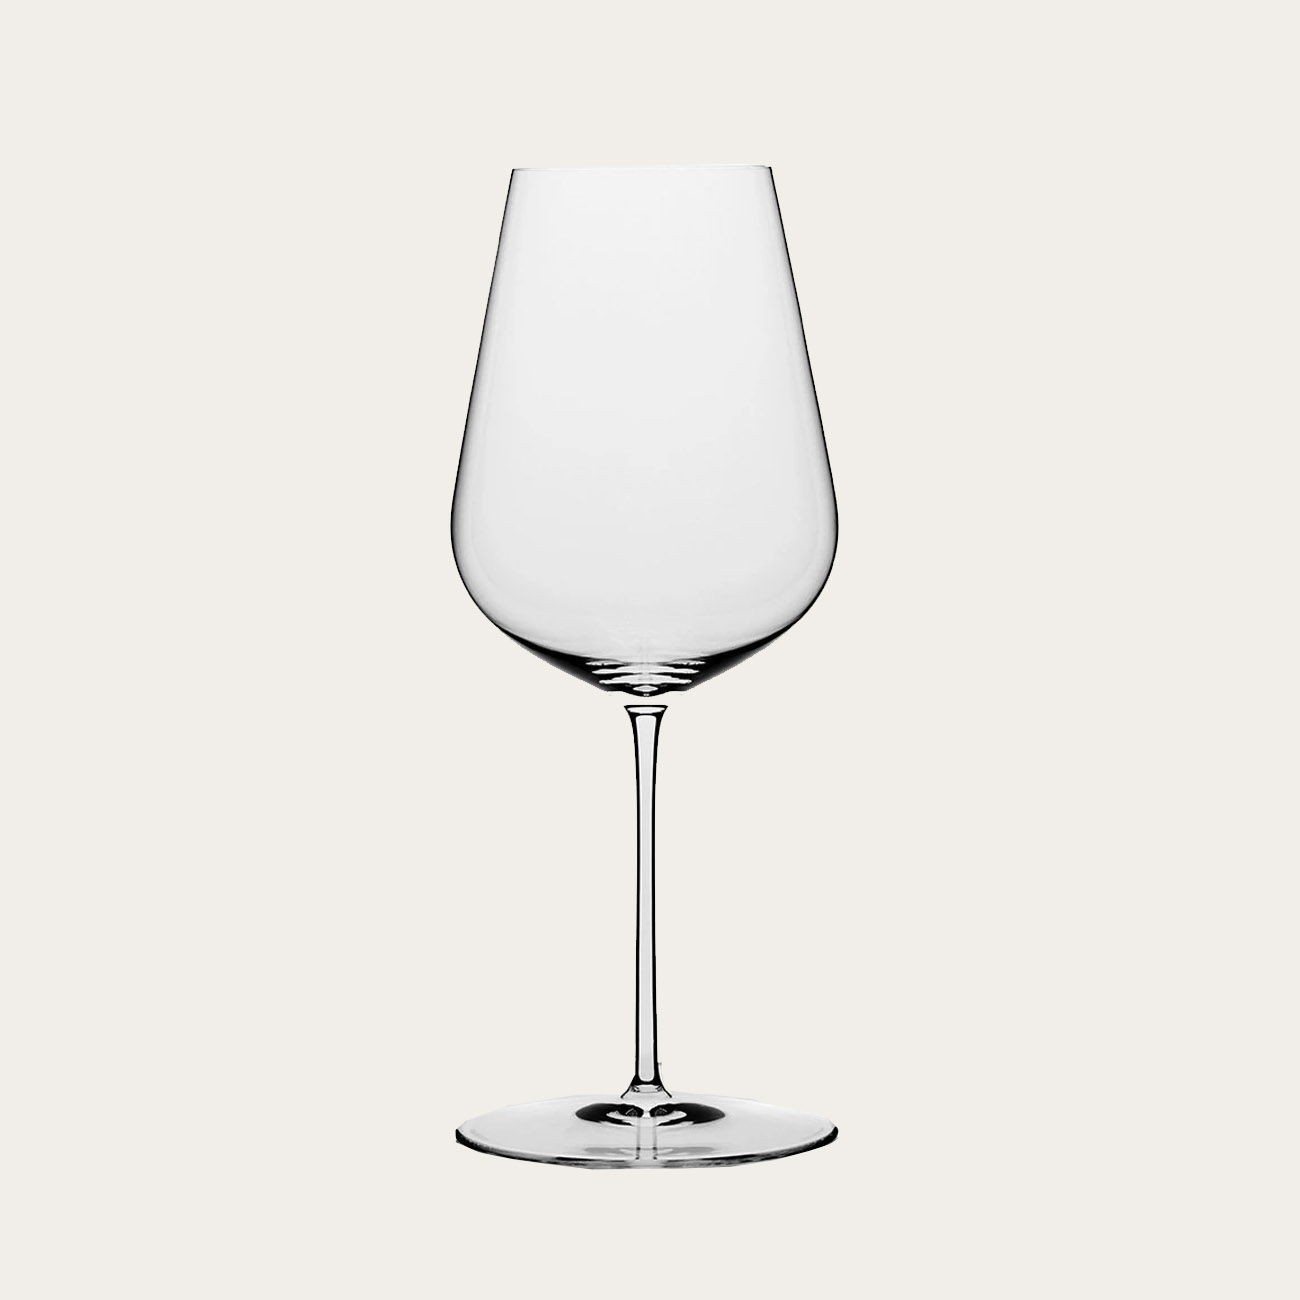 Universal Wine Glass by Jancis Robinson